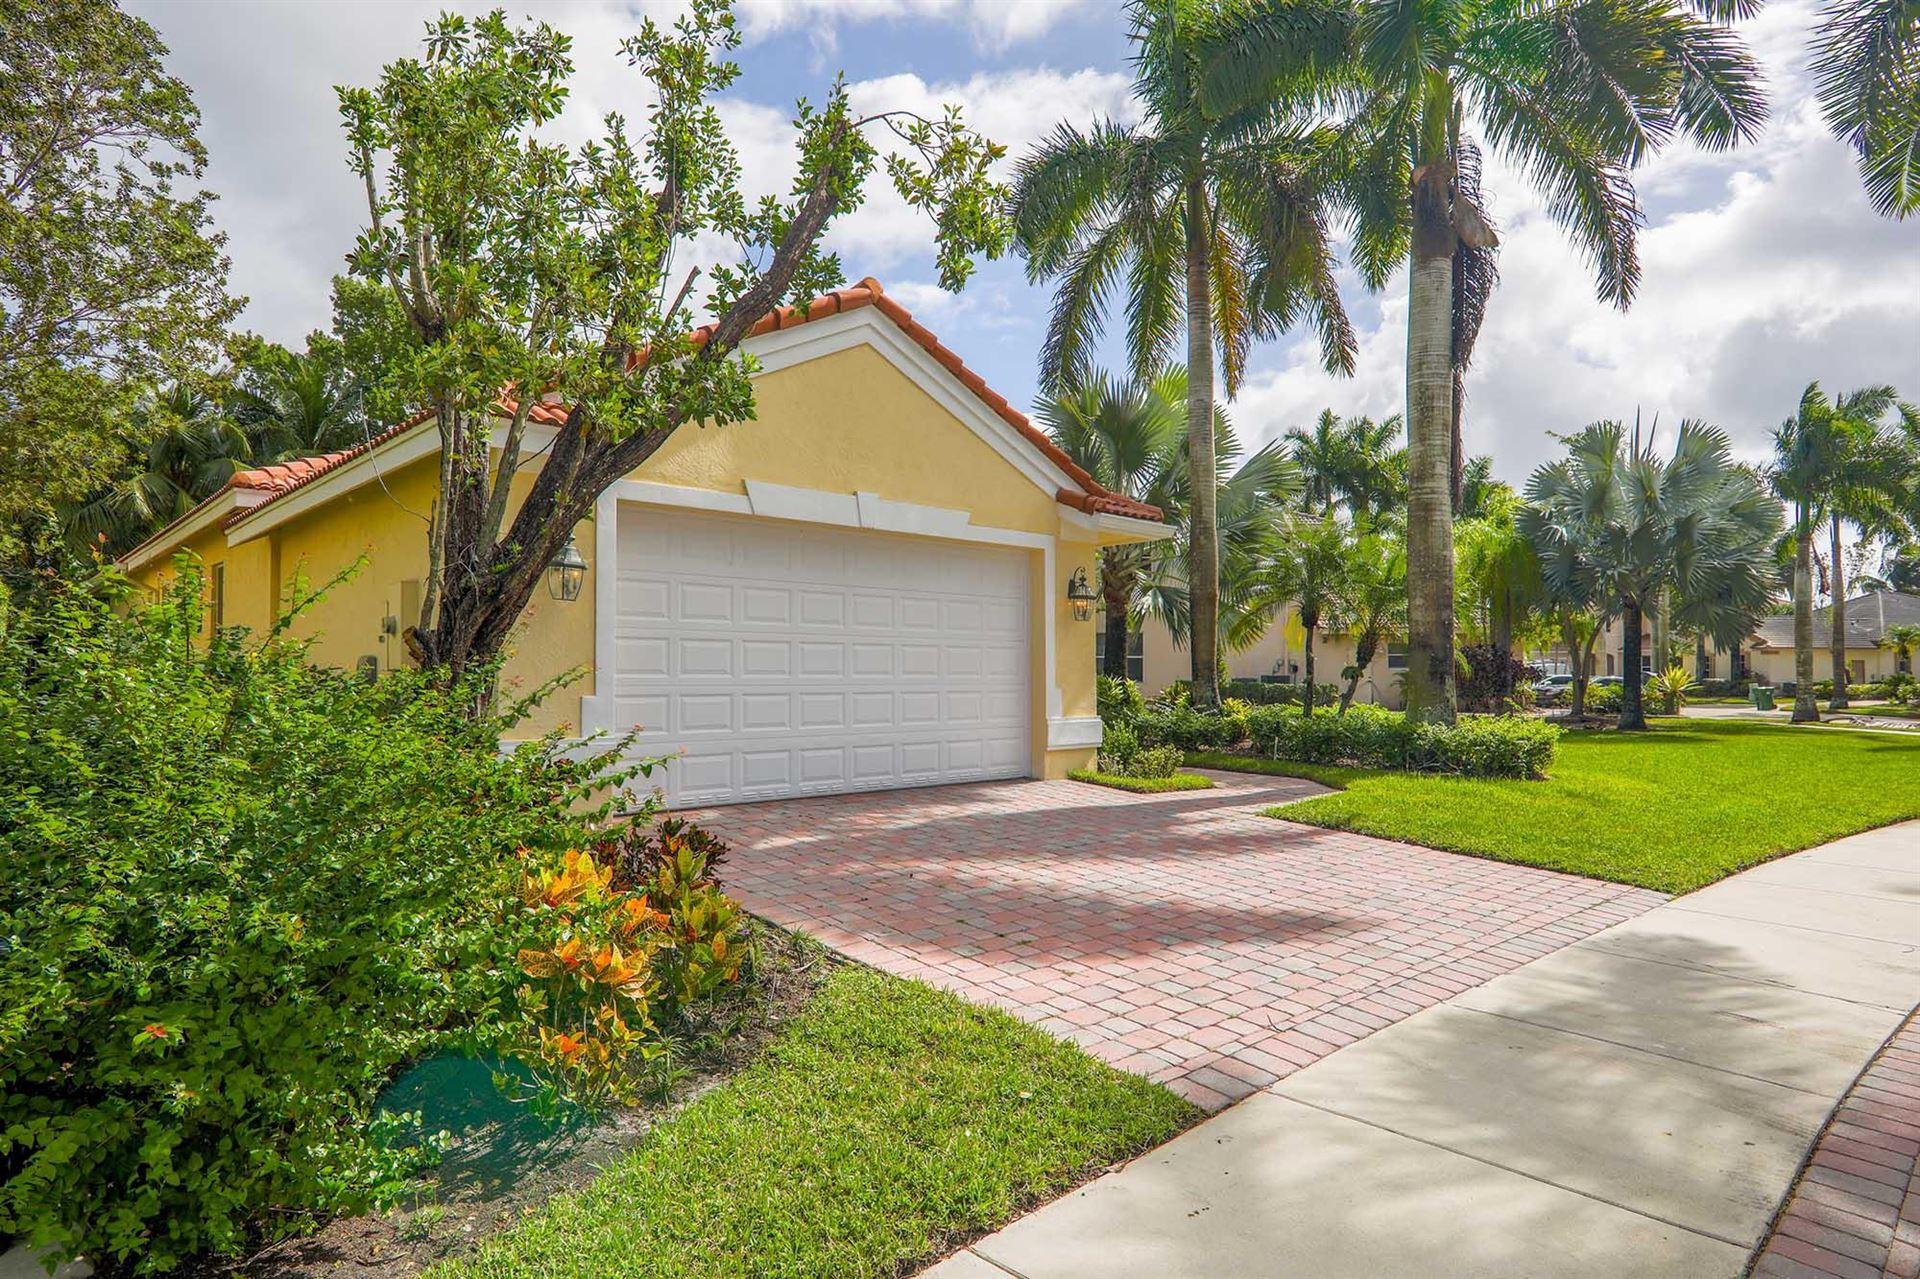 Photo of 1807 Mariners Lane, Weston, FL 33327 (MLS # RX-10673747)